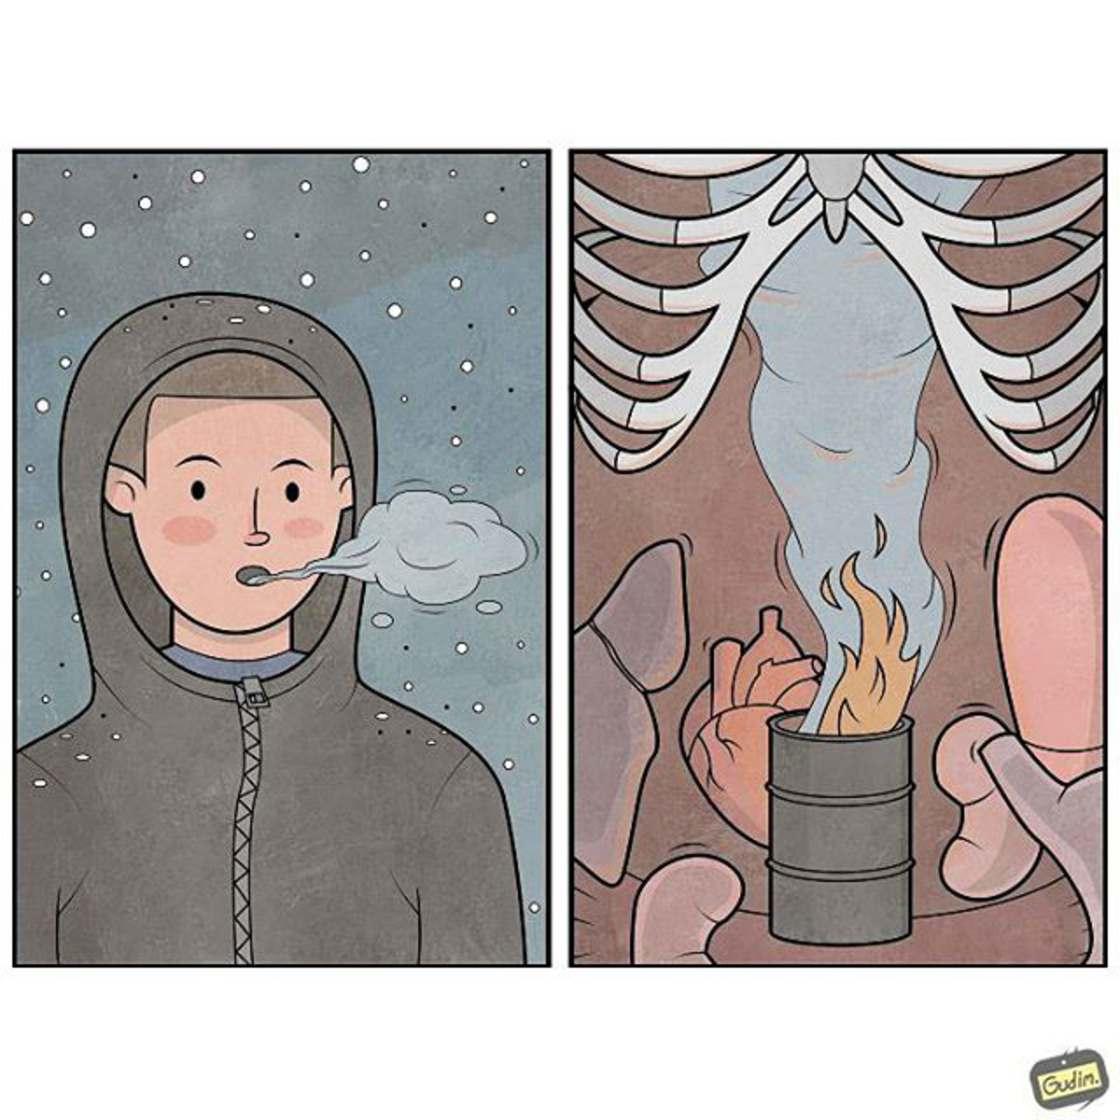 Life is Weird - Les nouvelles illustrations sarcastiques d'Anton Gudim